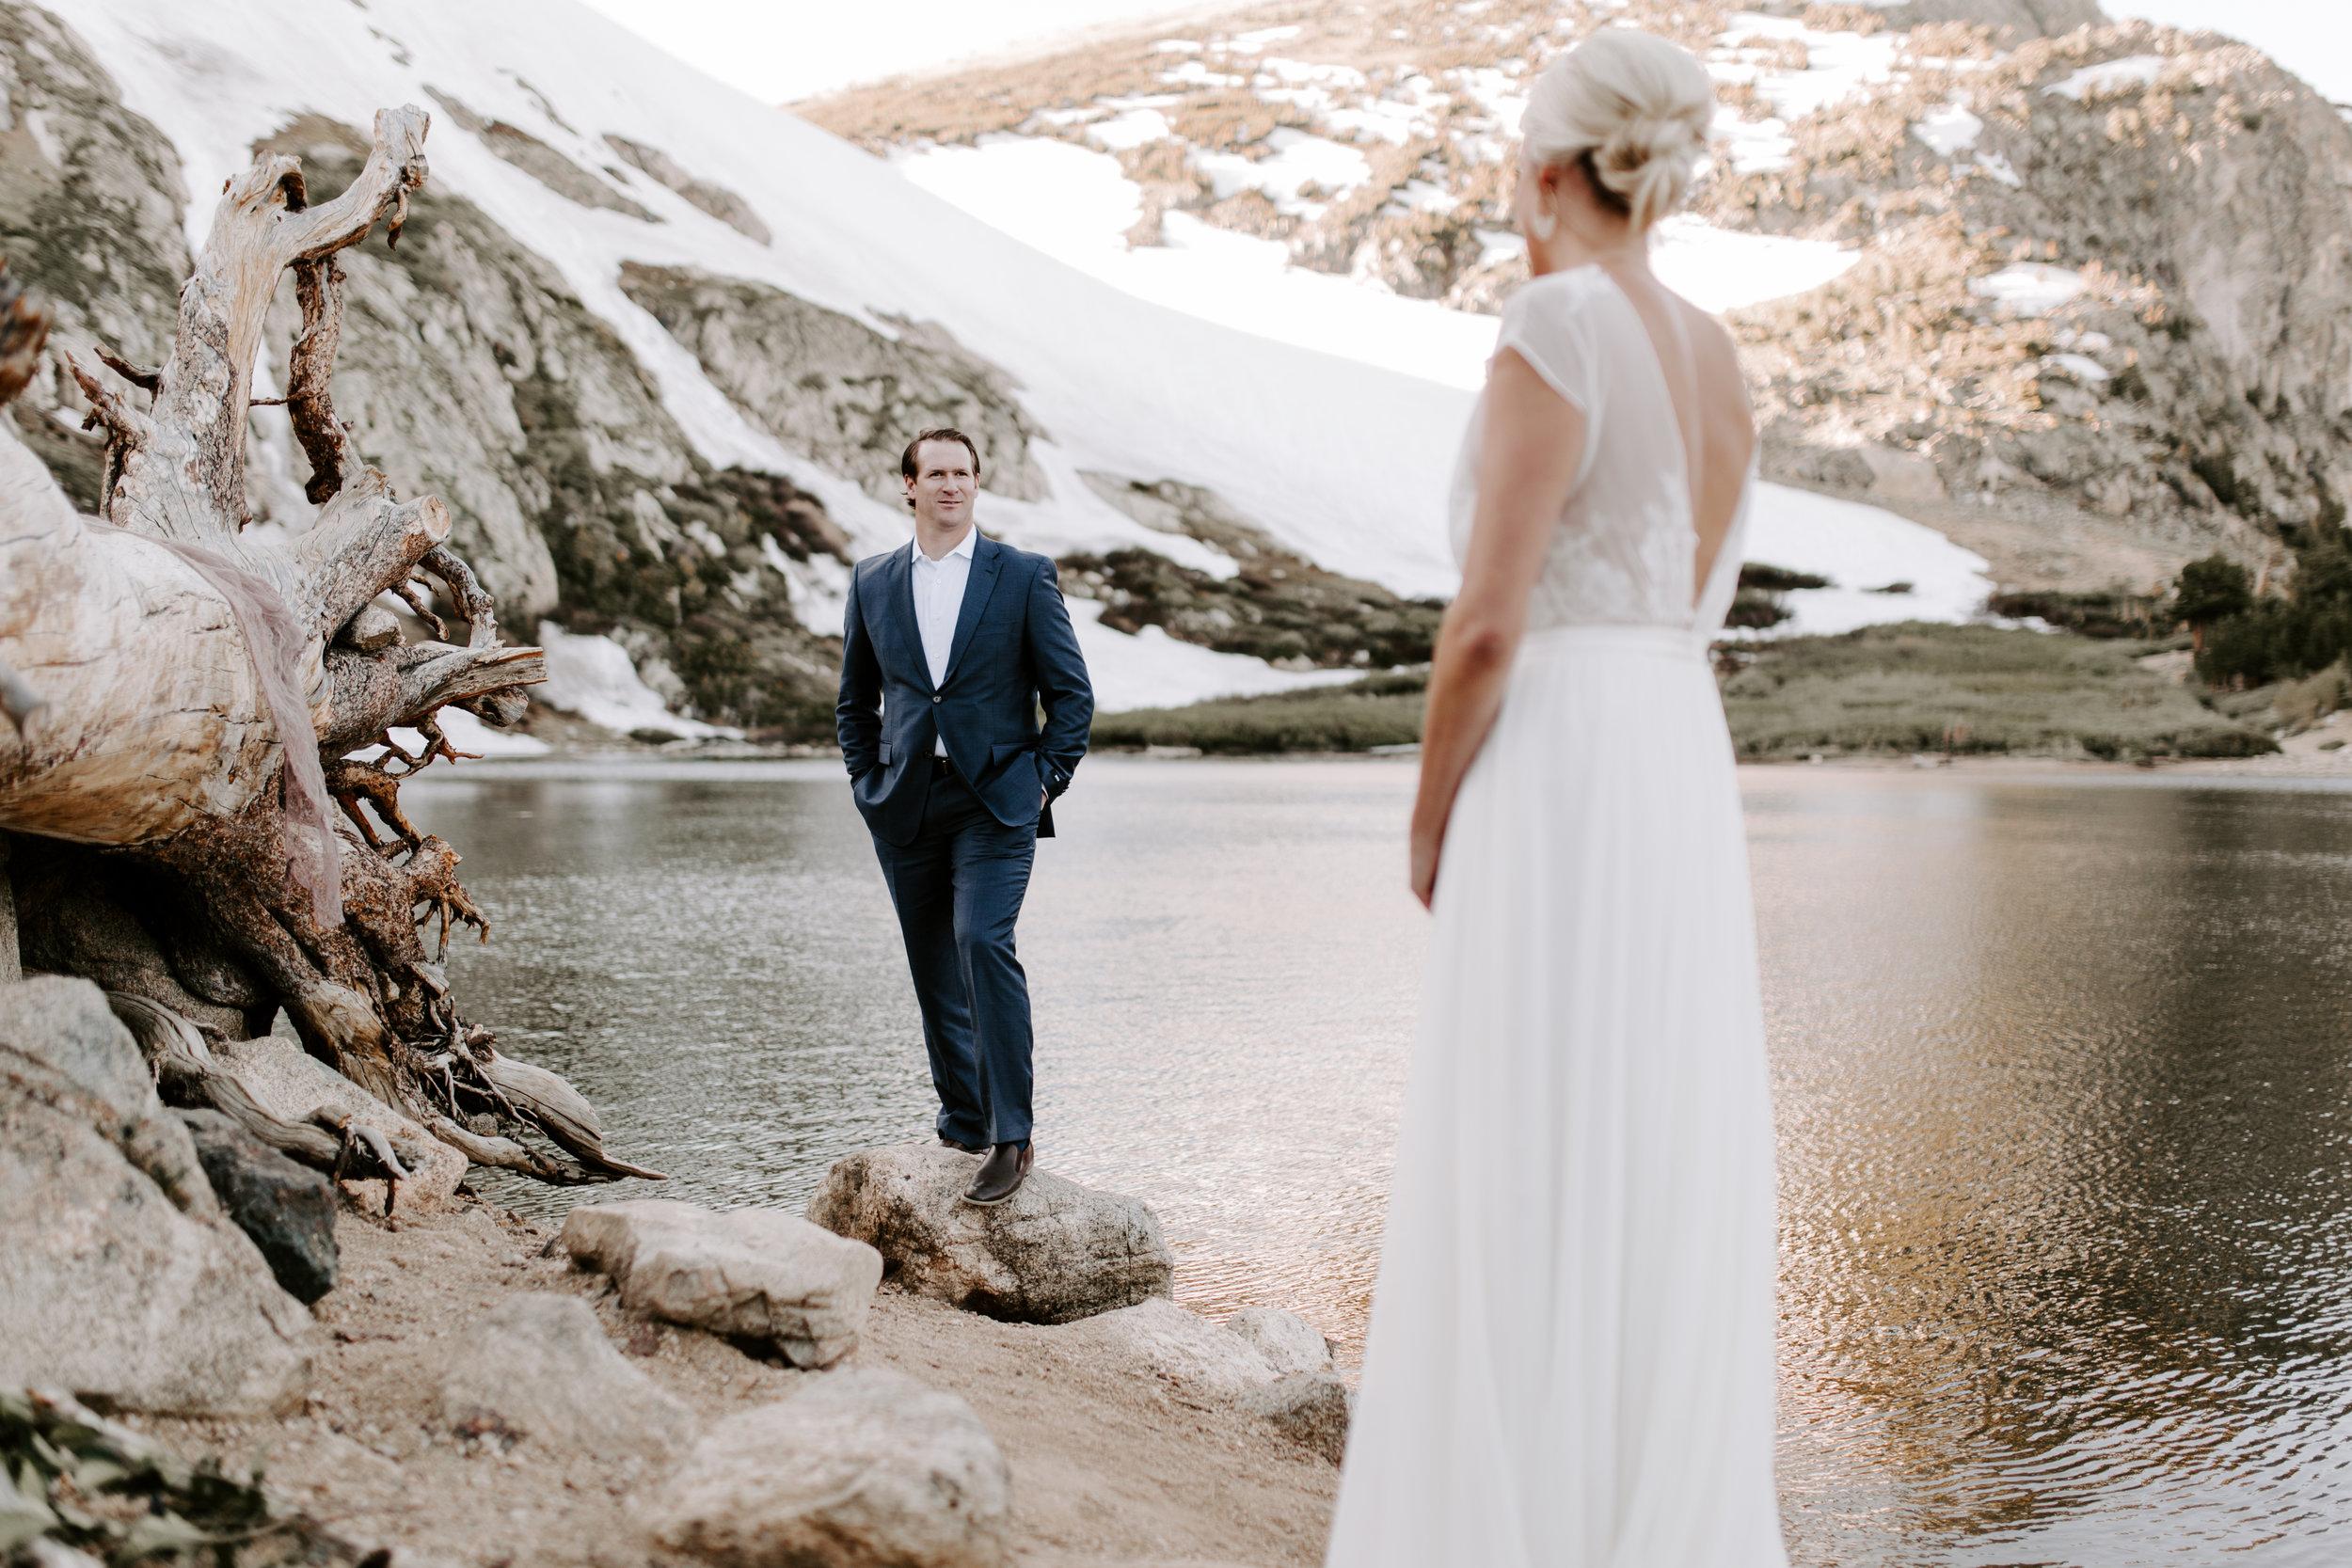 wedding elopement engagement anniversary travel colorado photographer photography-25.jpg